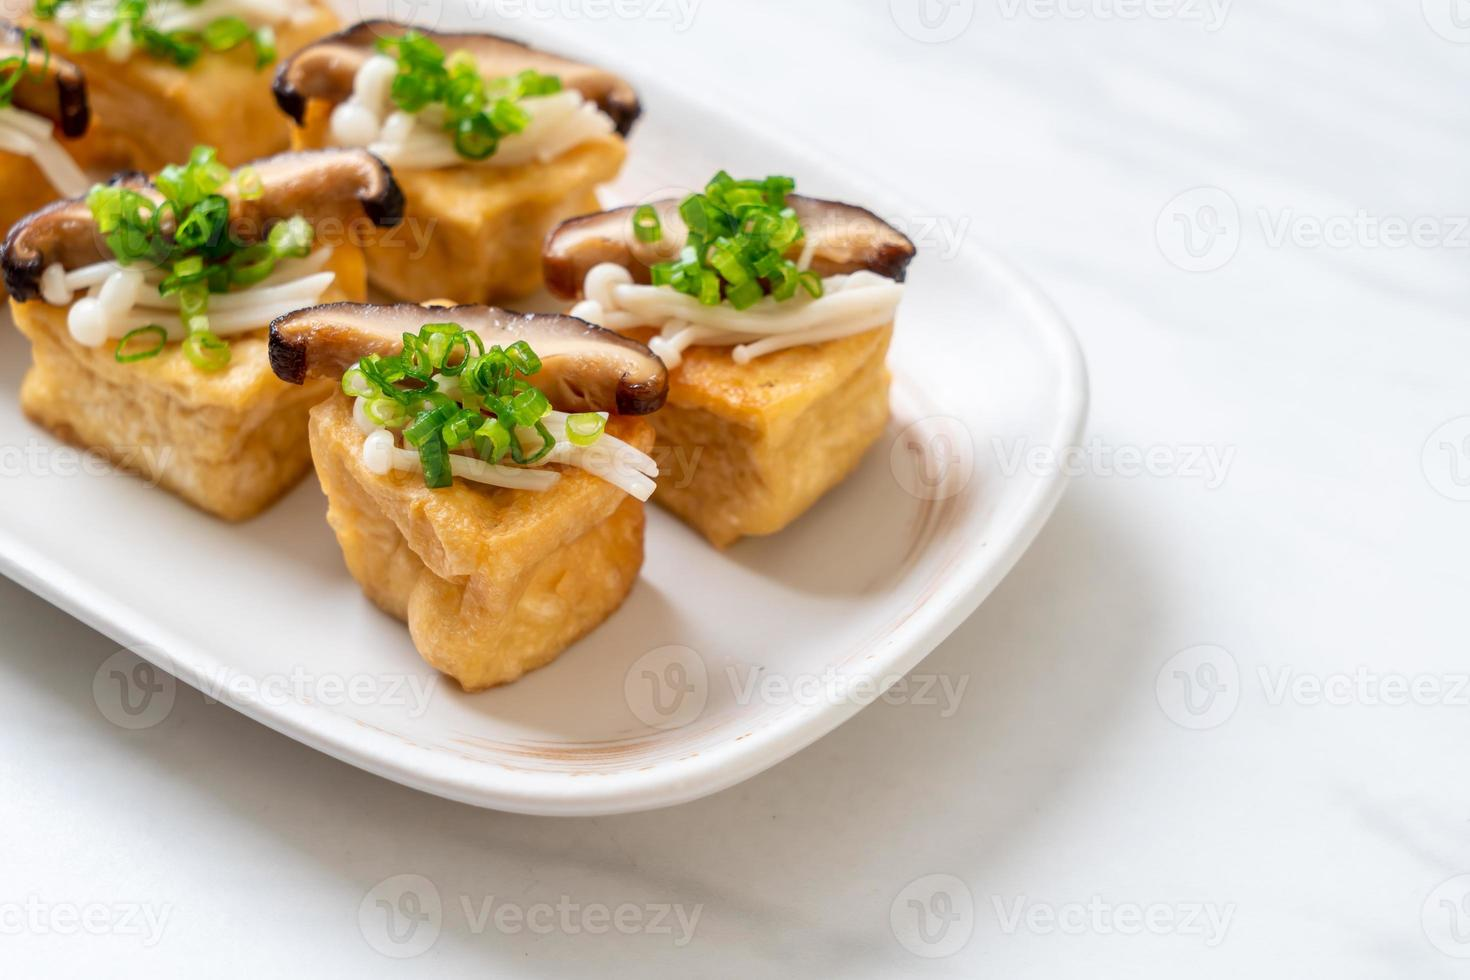 Grilled Tofu with Shitake Mushroom and Golden Needle Mushroom photo